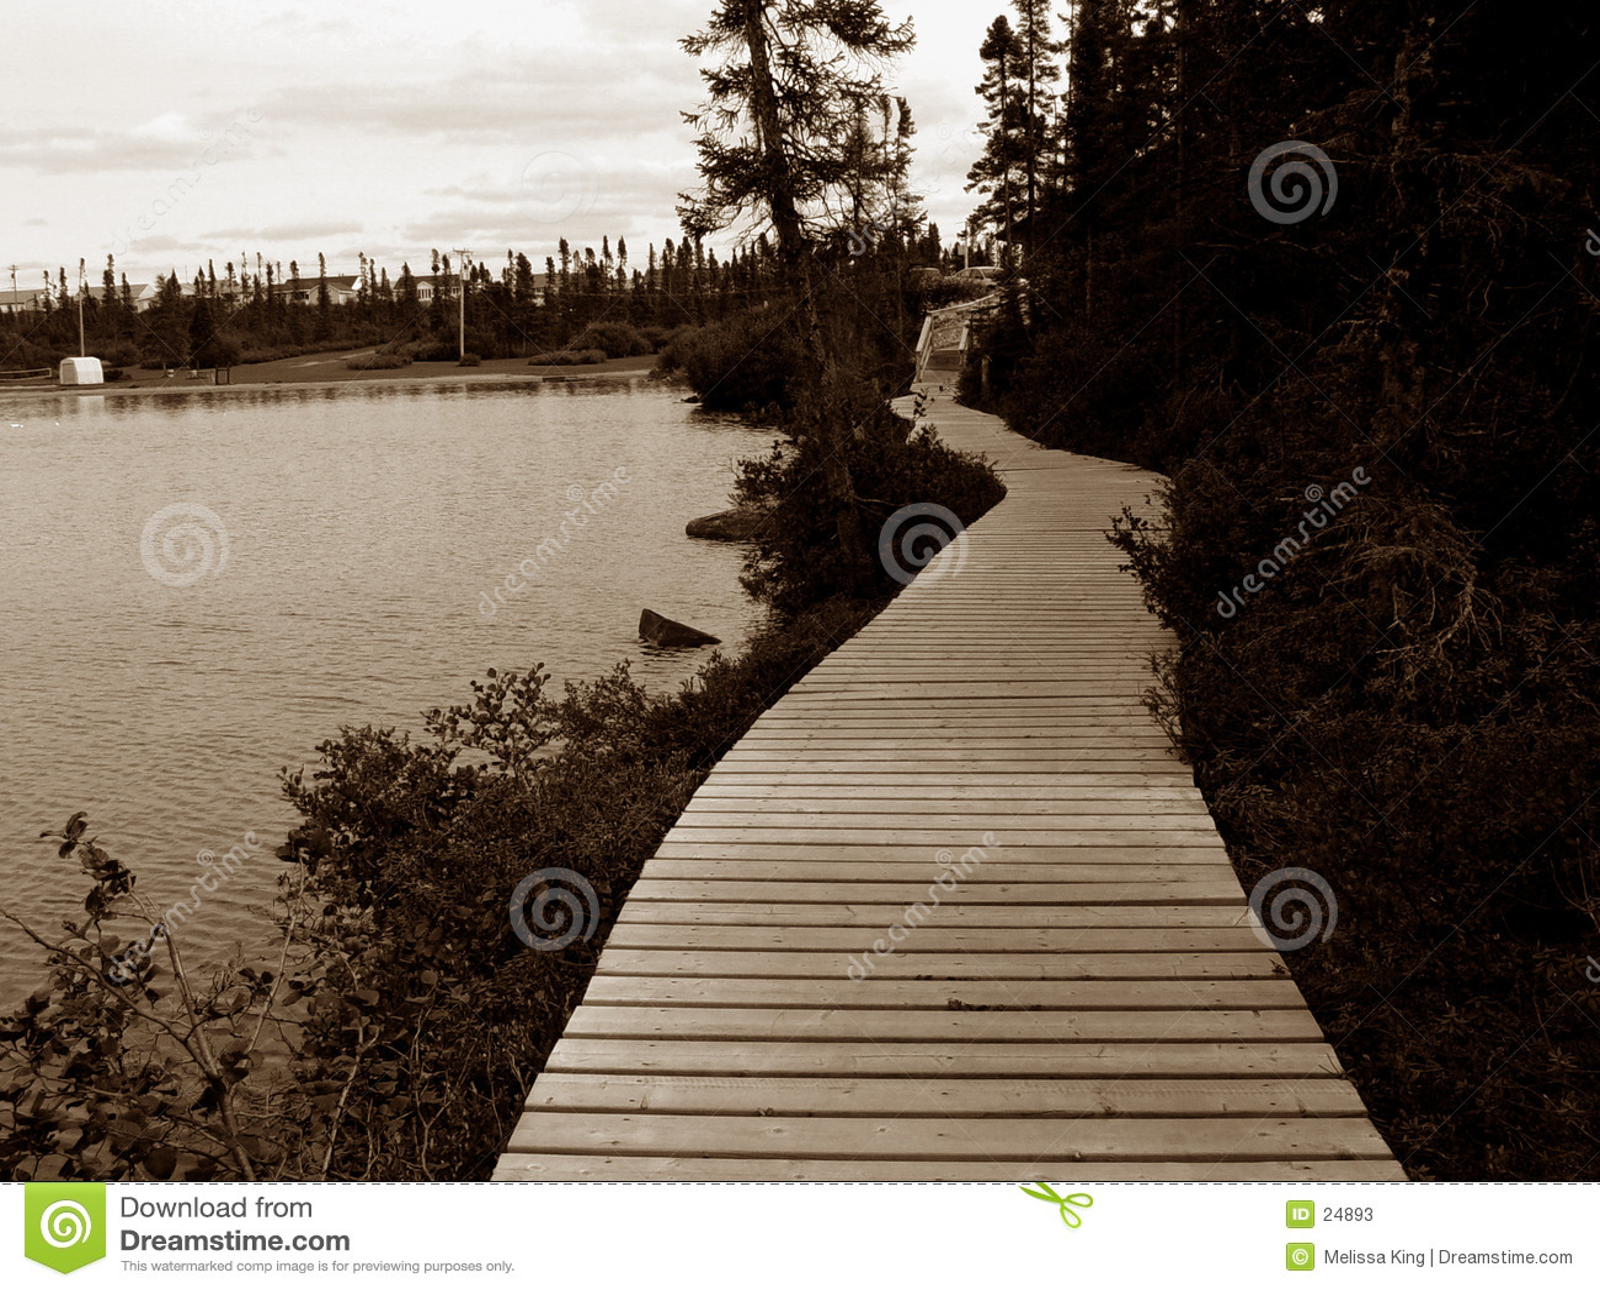 Pathway around Pond